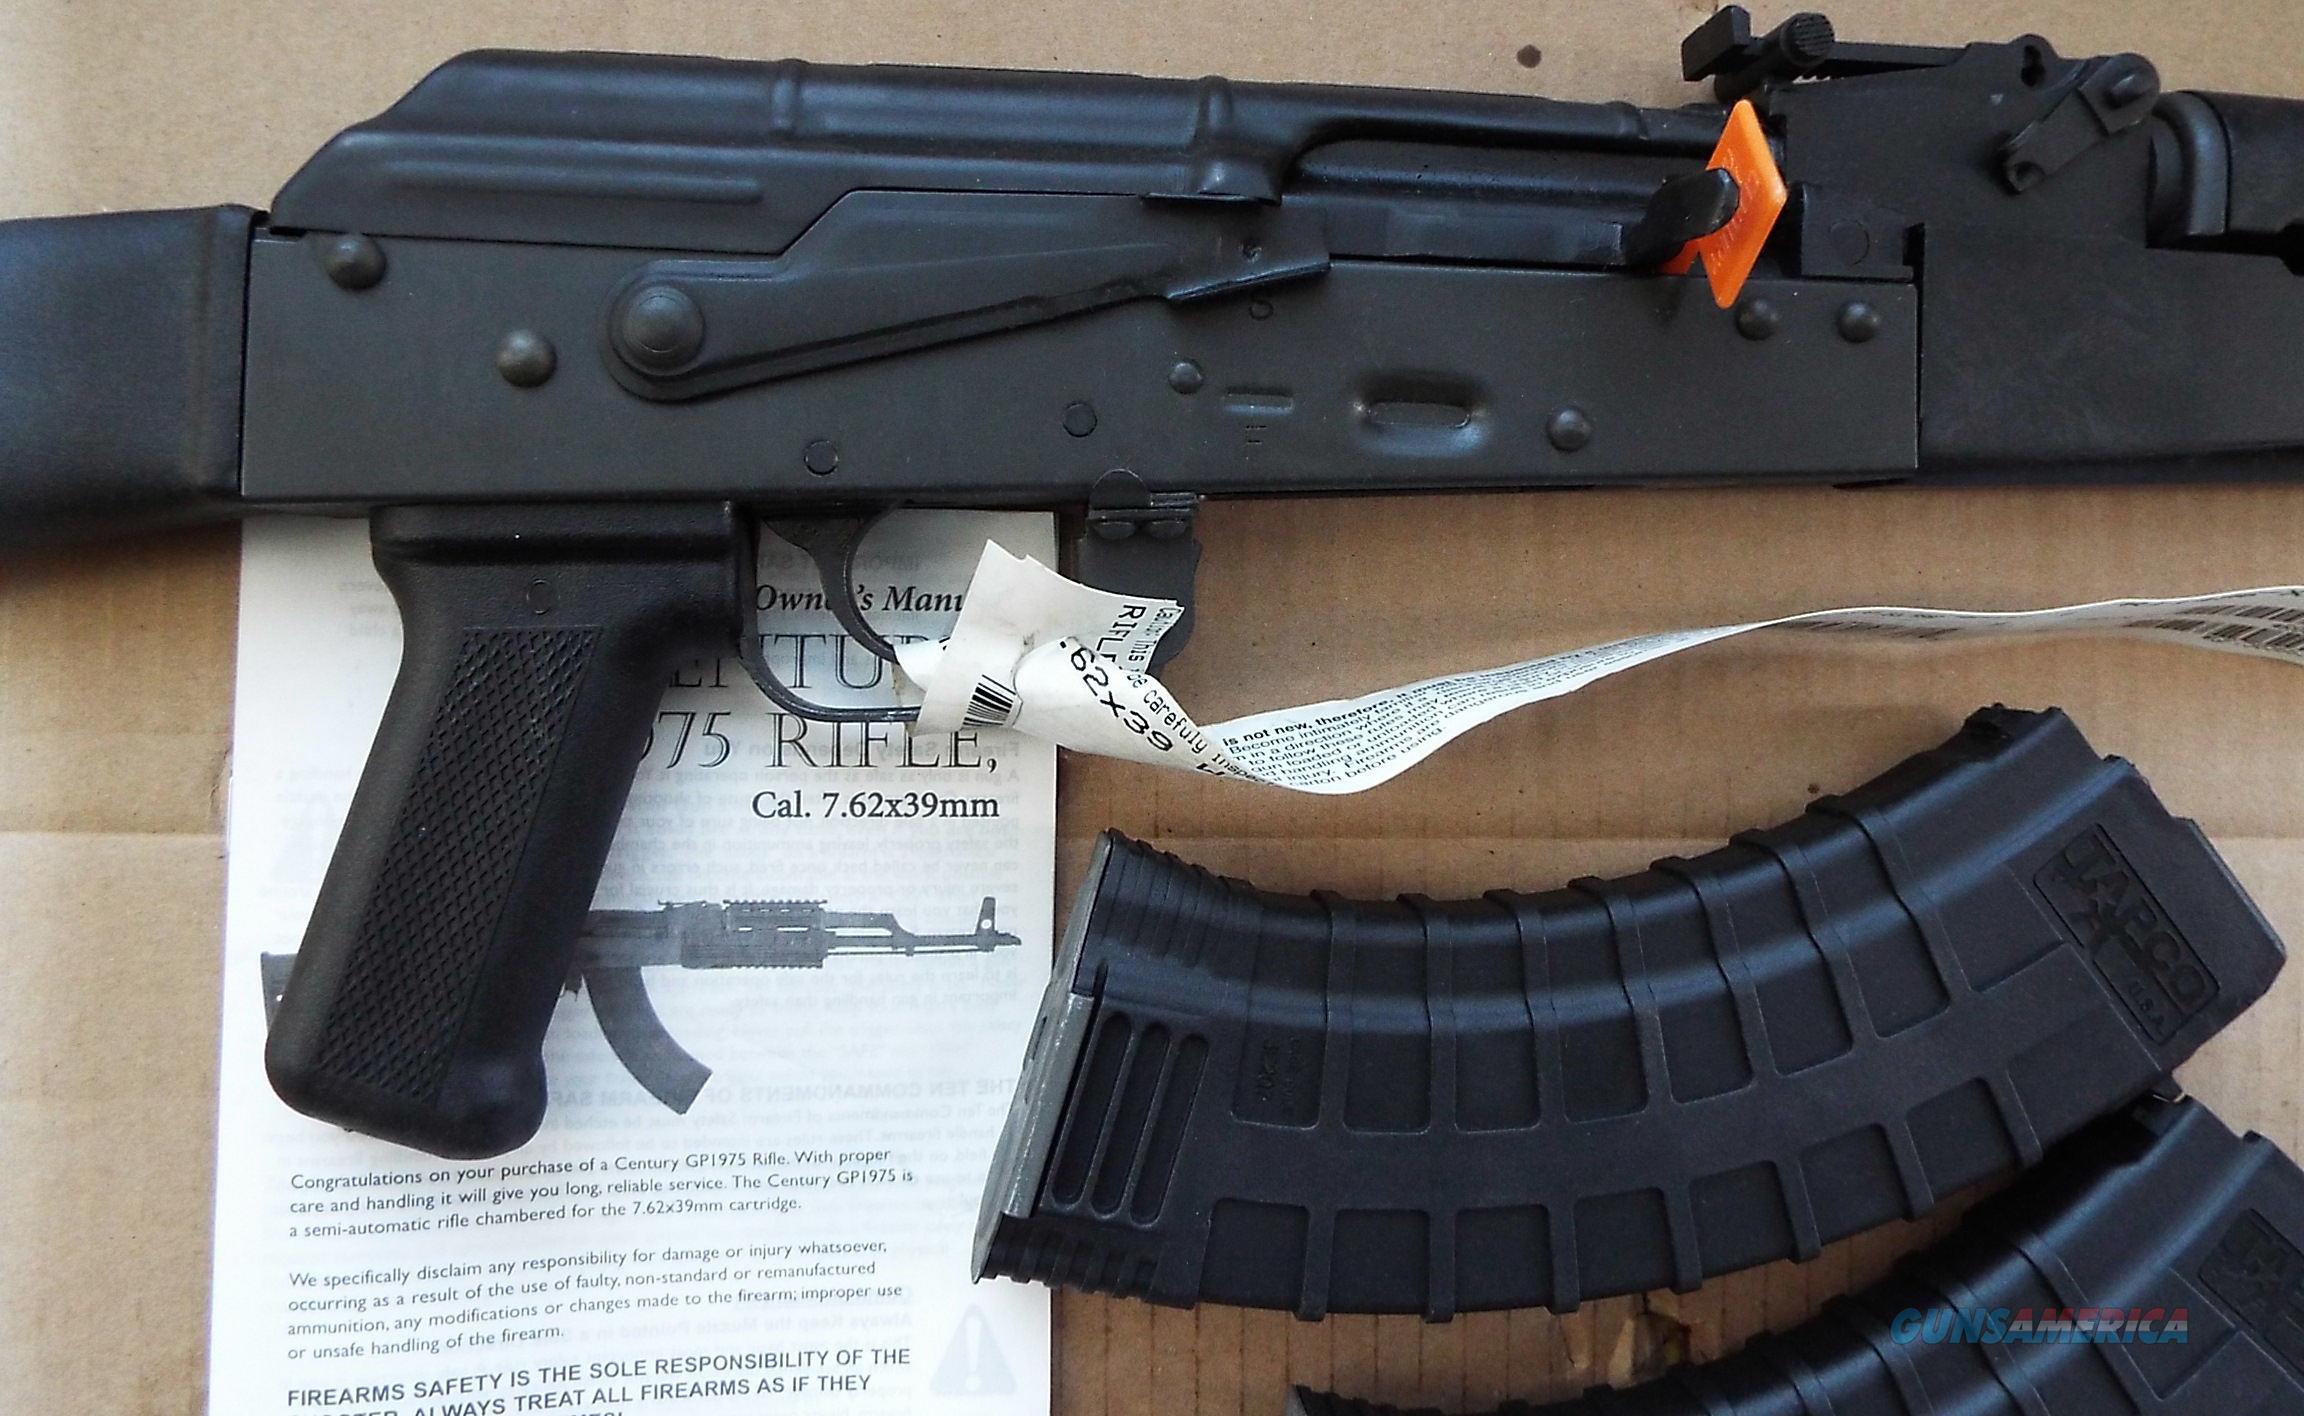 Century Arms GP1975 AK47 carbine 7.62x39mm  New!  LAYAWAY OPTION  RI1496-X  AK47  Guns > Rifles > Century International Arms - Rifles > Rifles